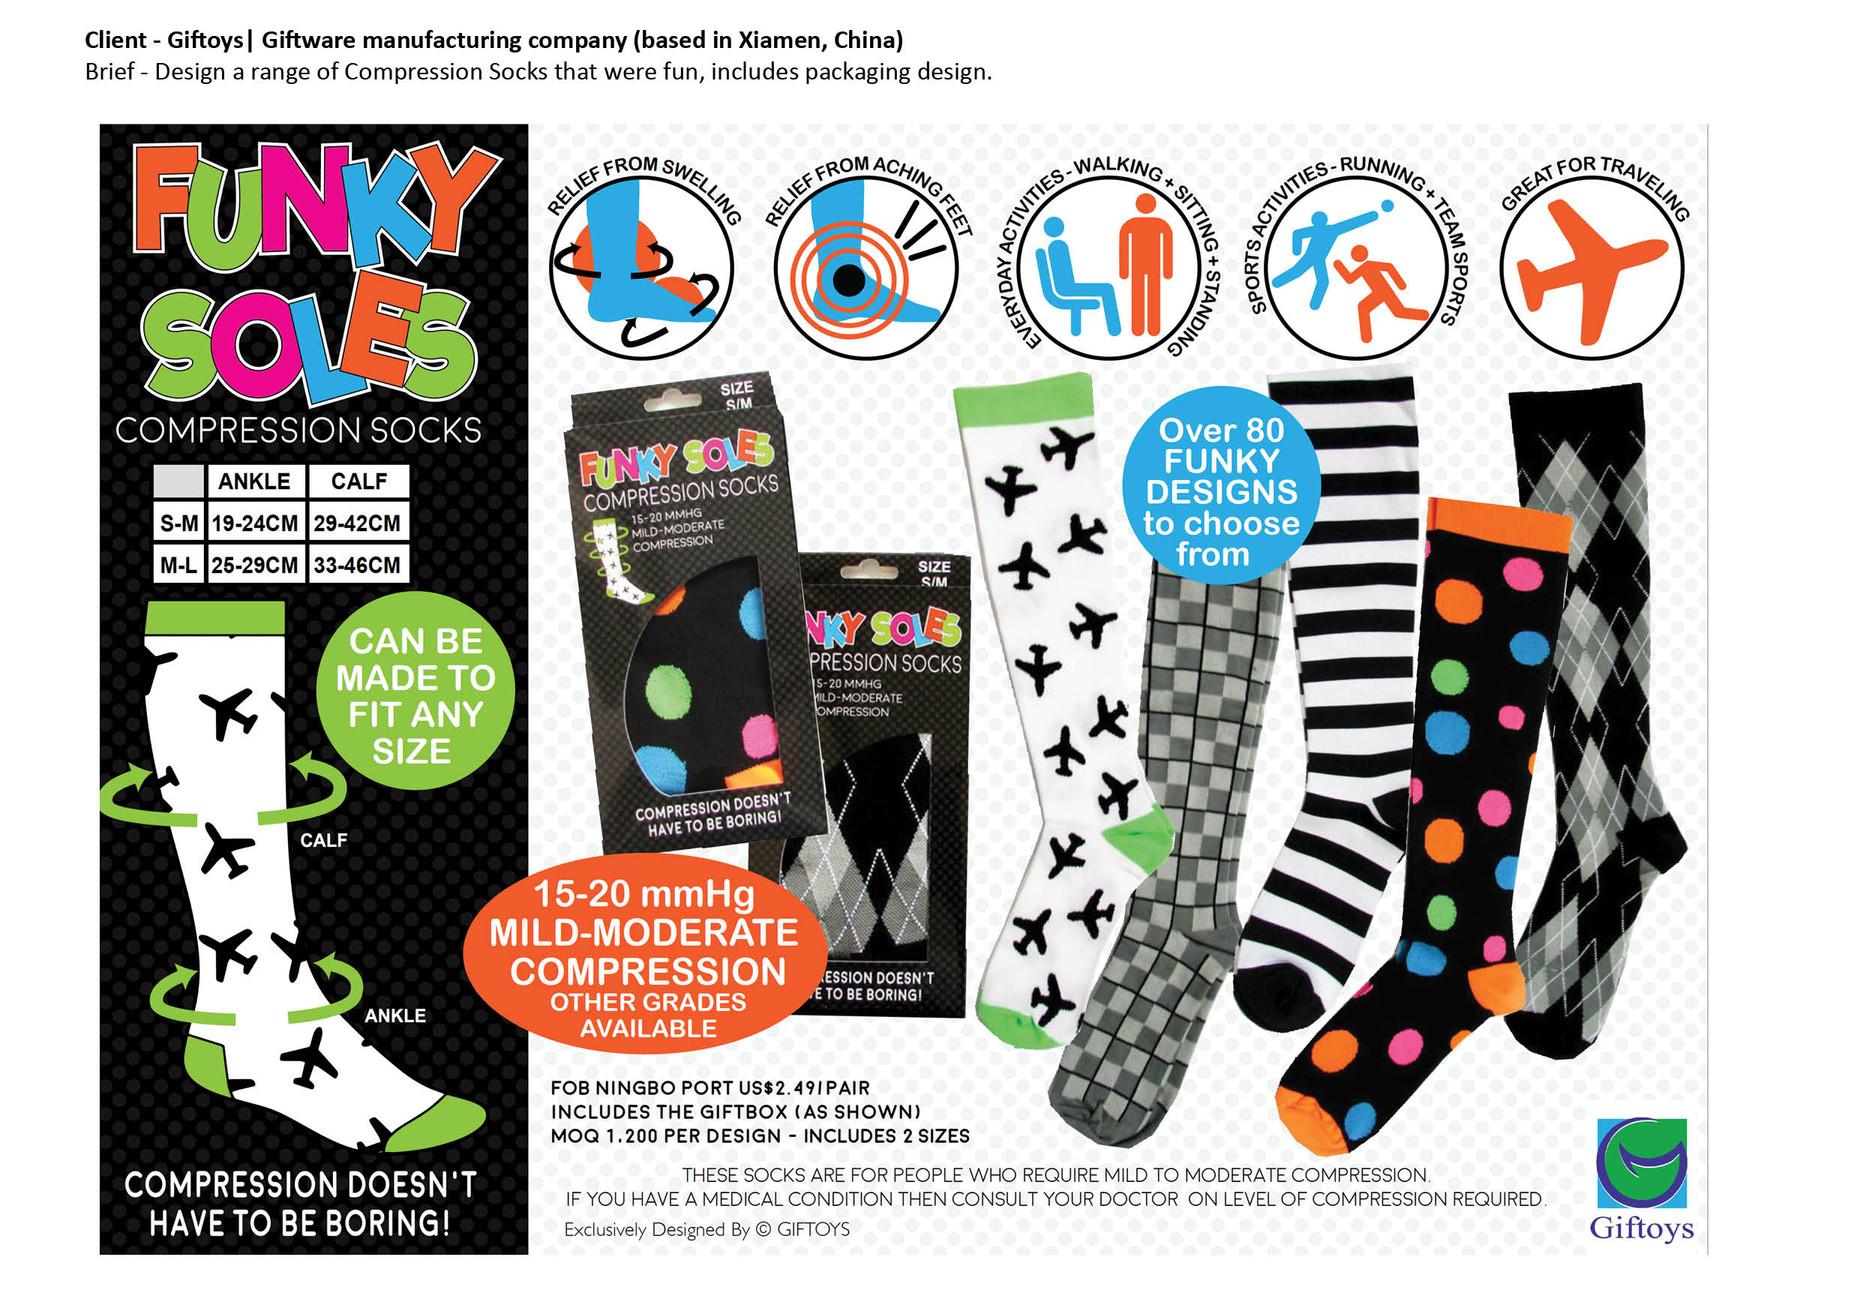 giftoys compression socks.jpg